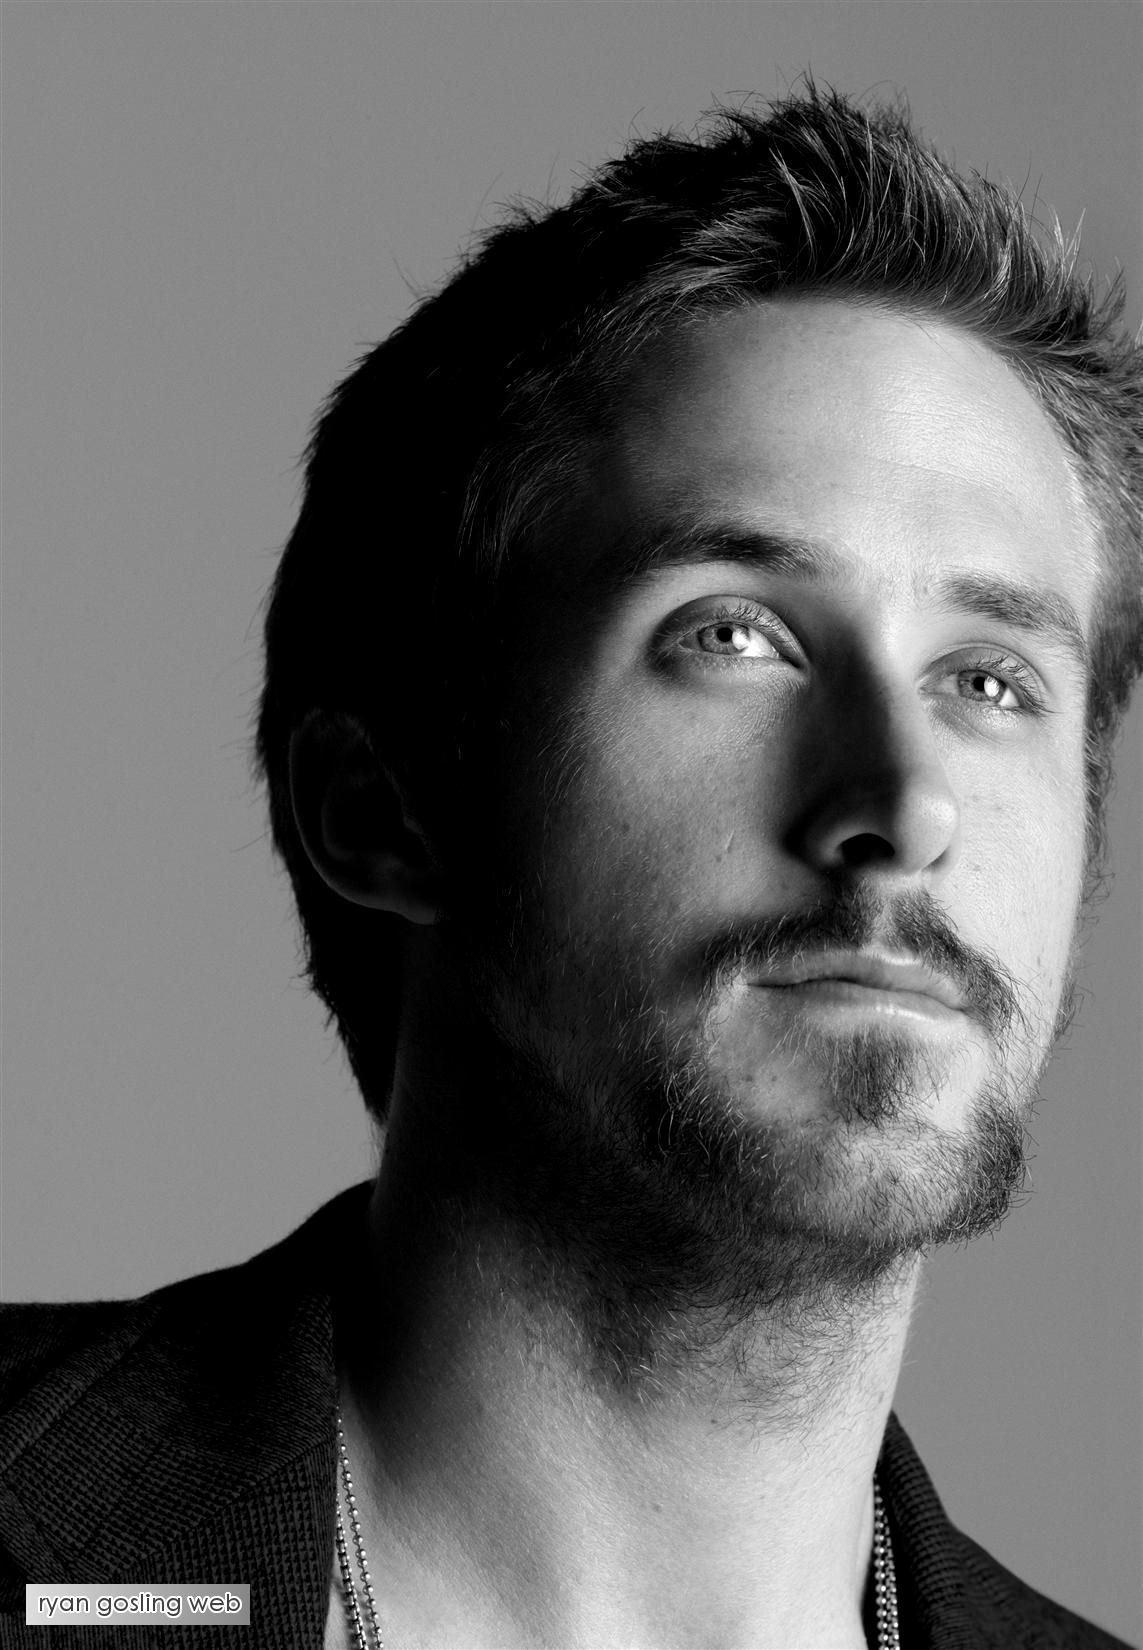 Ryan Gosling Christian Bale Steve Carell Cover New York: Ryan Gosling Eye Candy